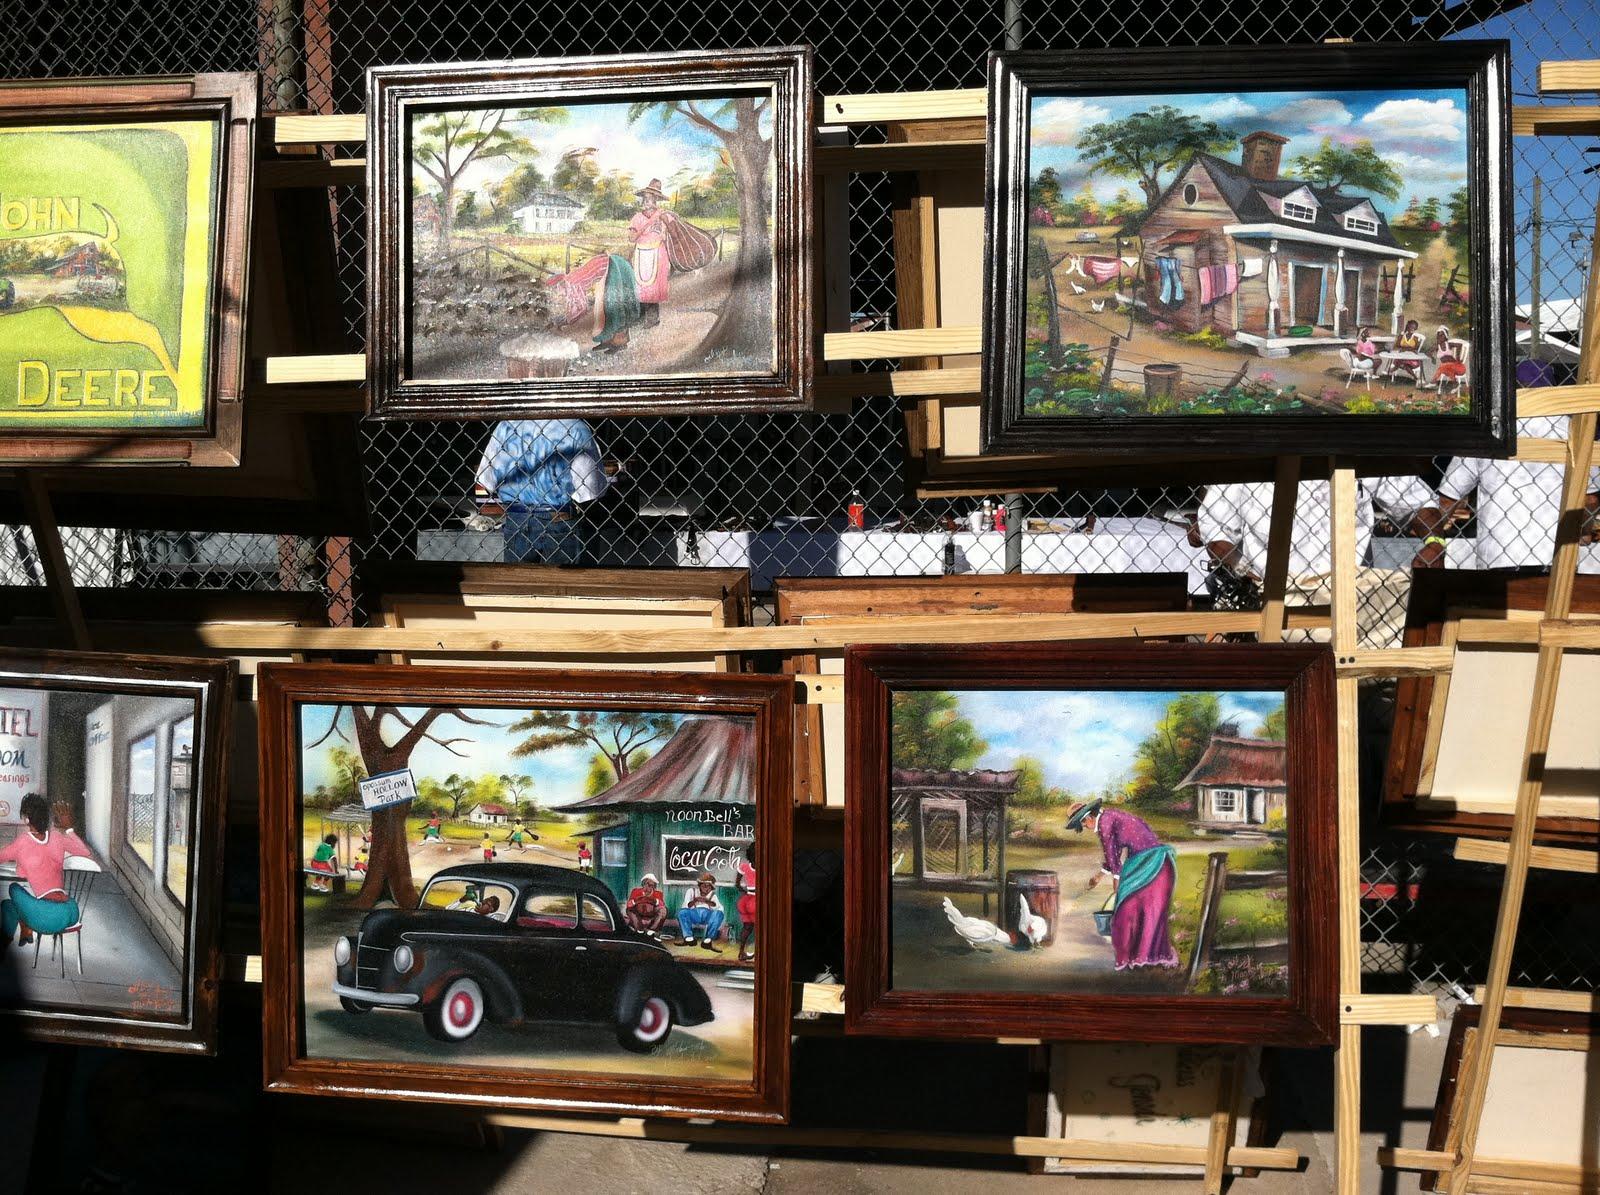 Angola prison rodeo gift shop